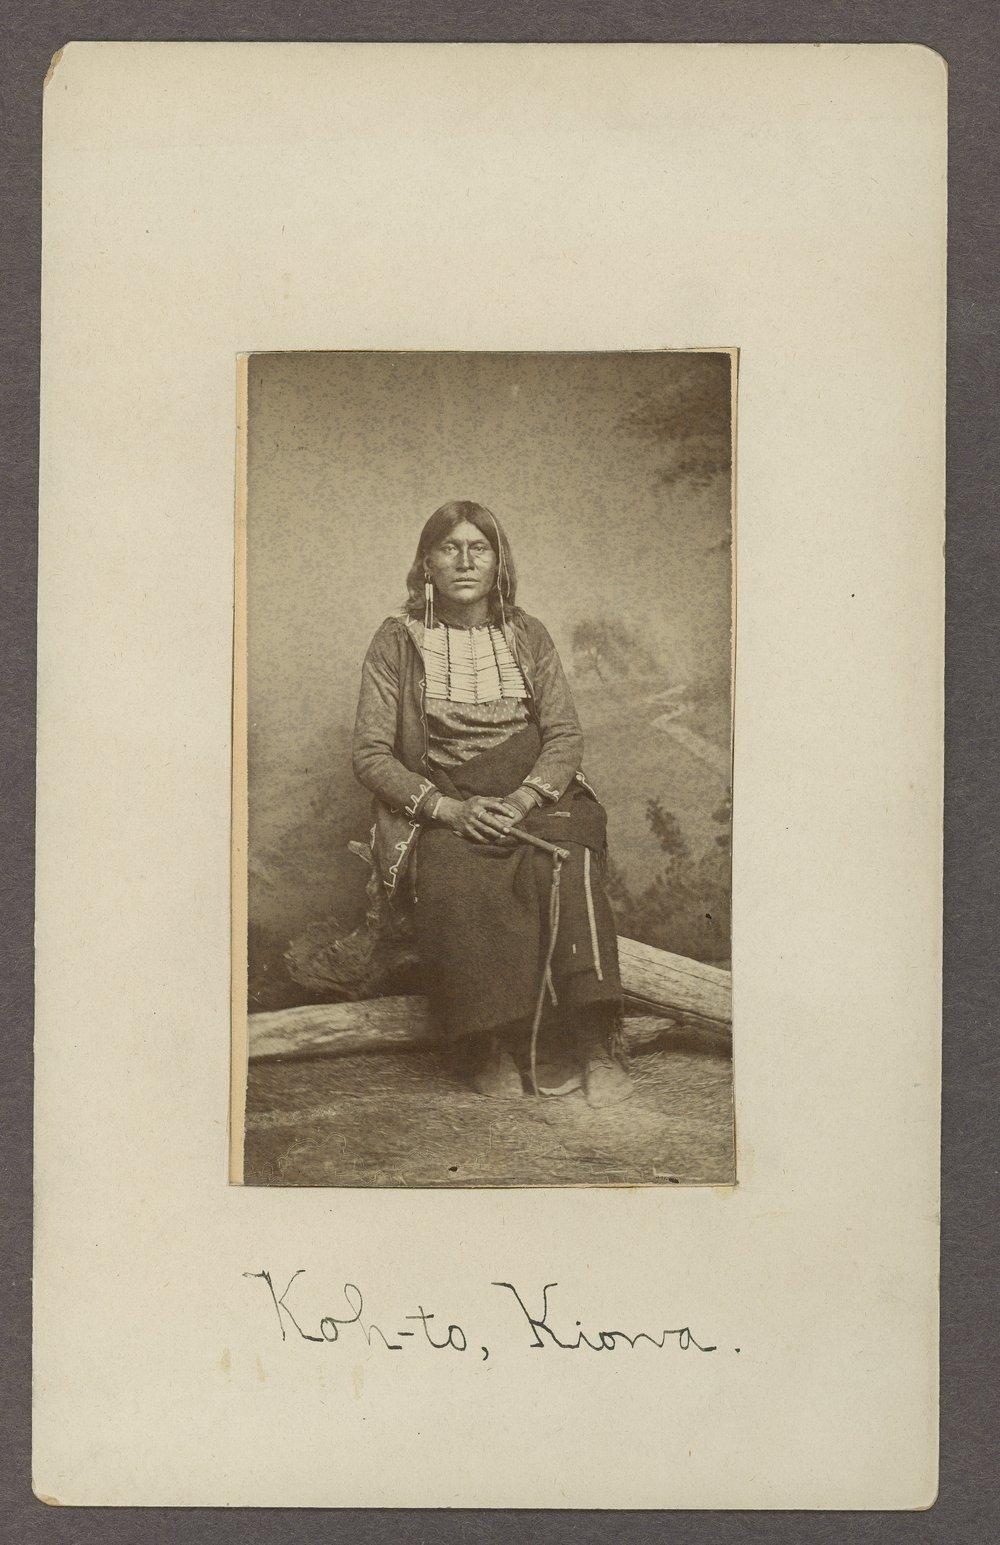 Koh-to, Kiowa brave, in Indian Territory - 1